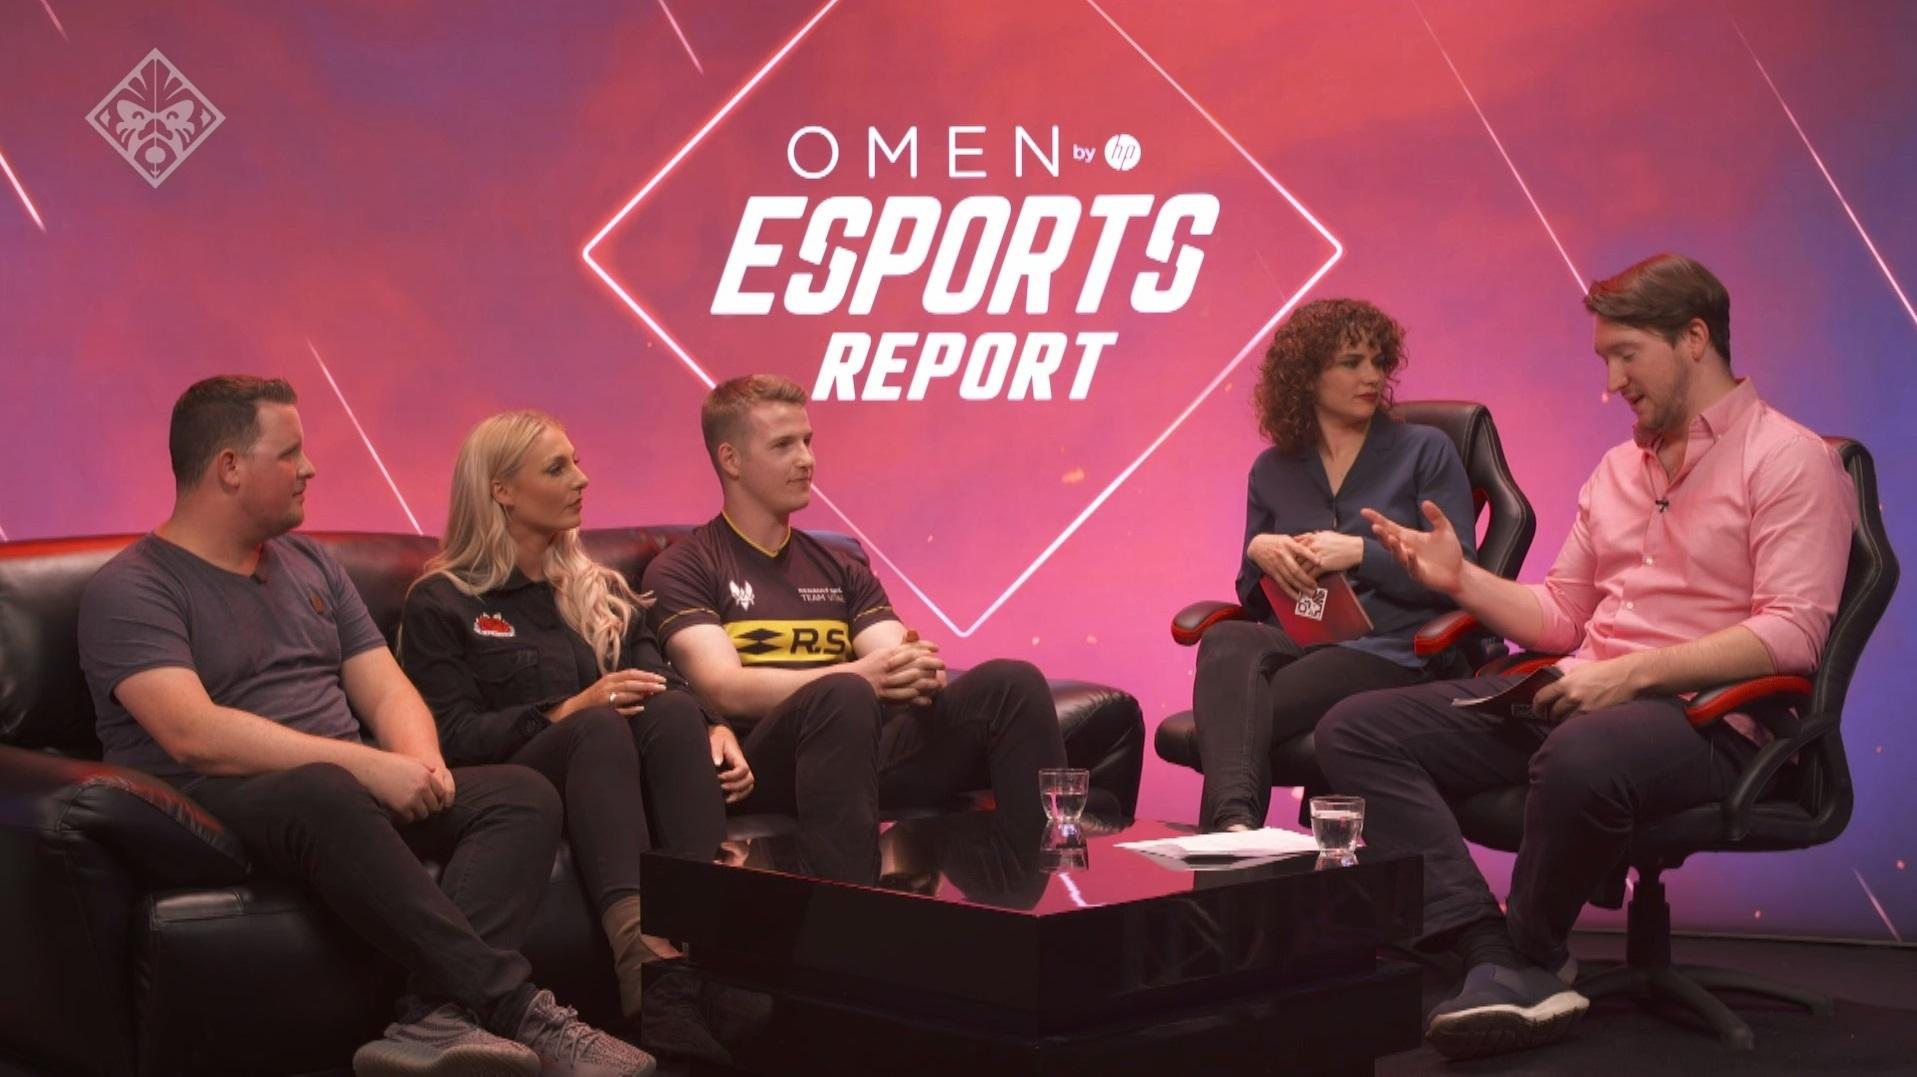 Team Vitality coach Gregan discusses picking up teenage Rocket League whiz Scrub Killa on the OMEN Esports Report